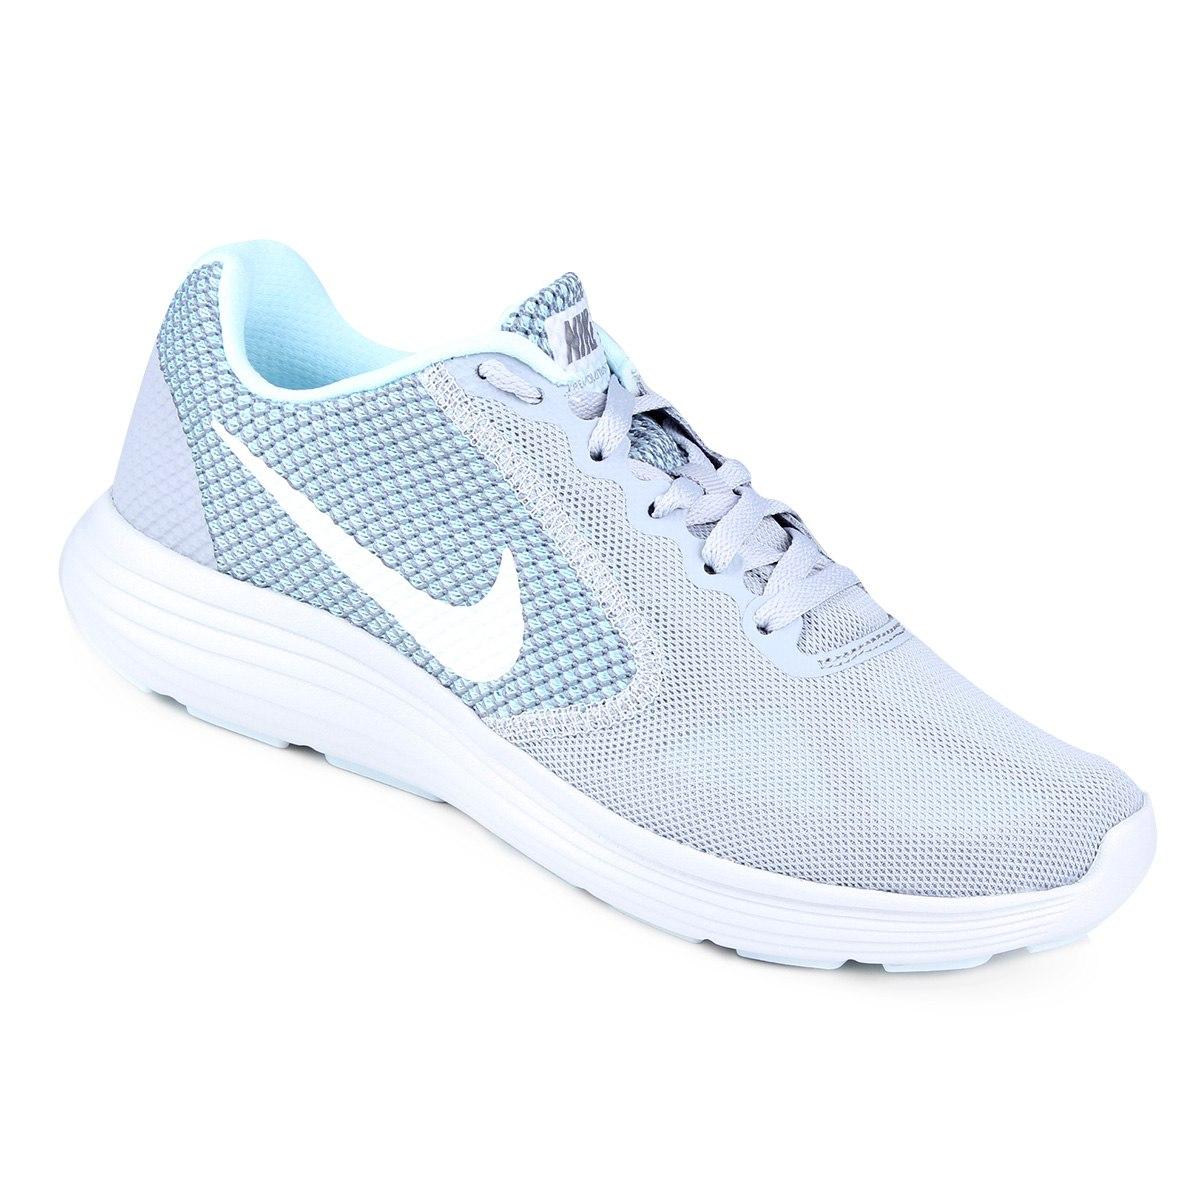 tenis nike - Tênis Nike Revolution 3 Feminino - R$ 184,90